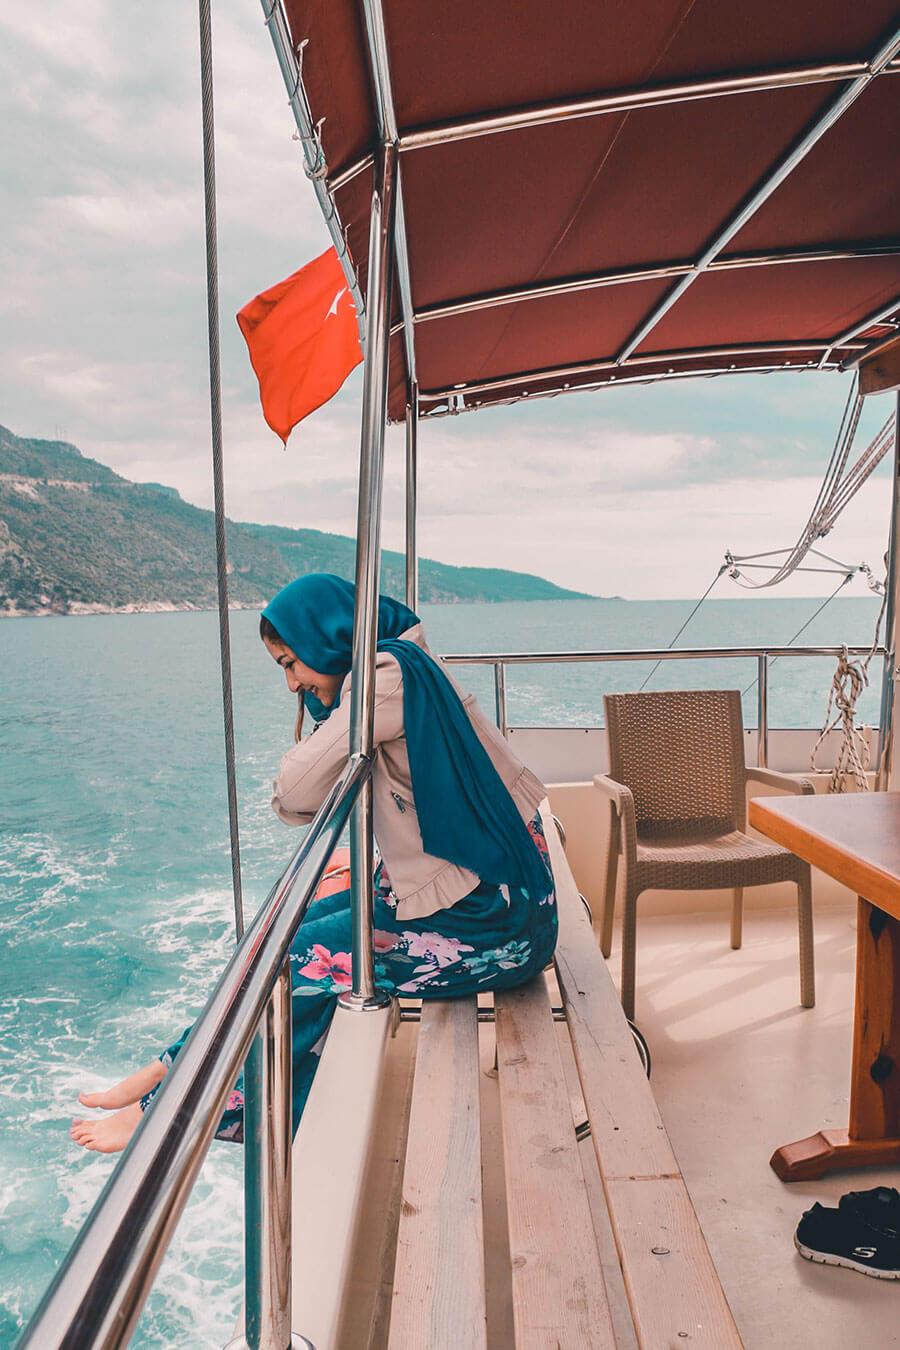 12-island tour in Fethiye